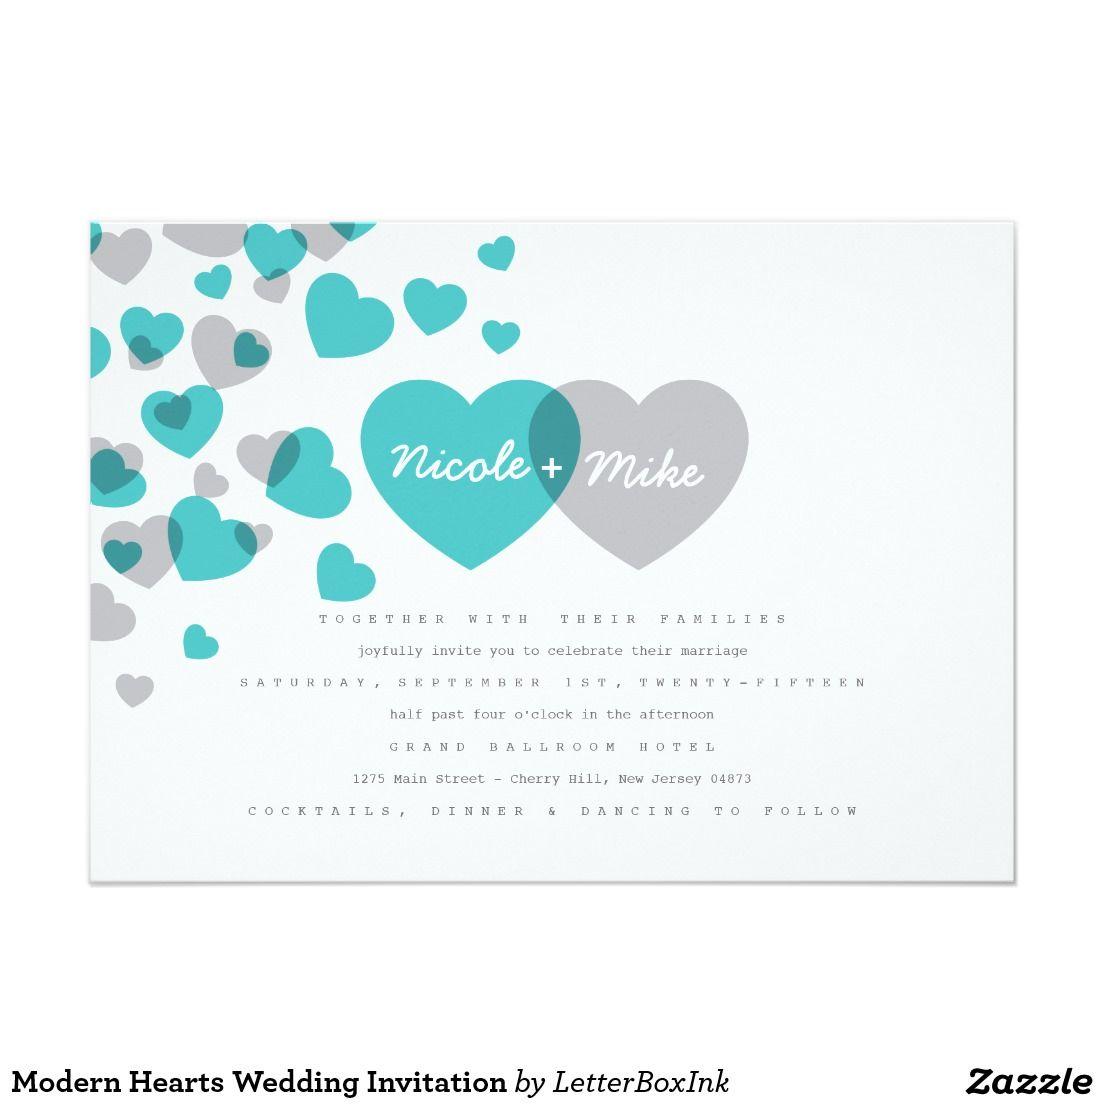 Modern Hearts Wedding Invitation